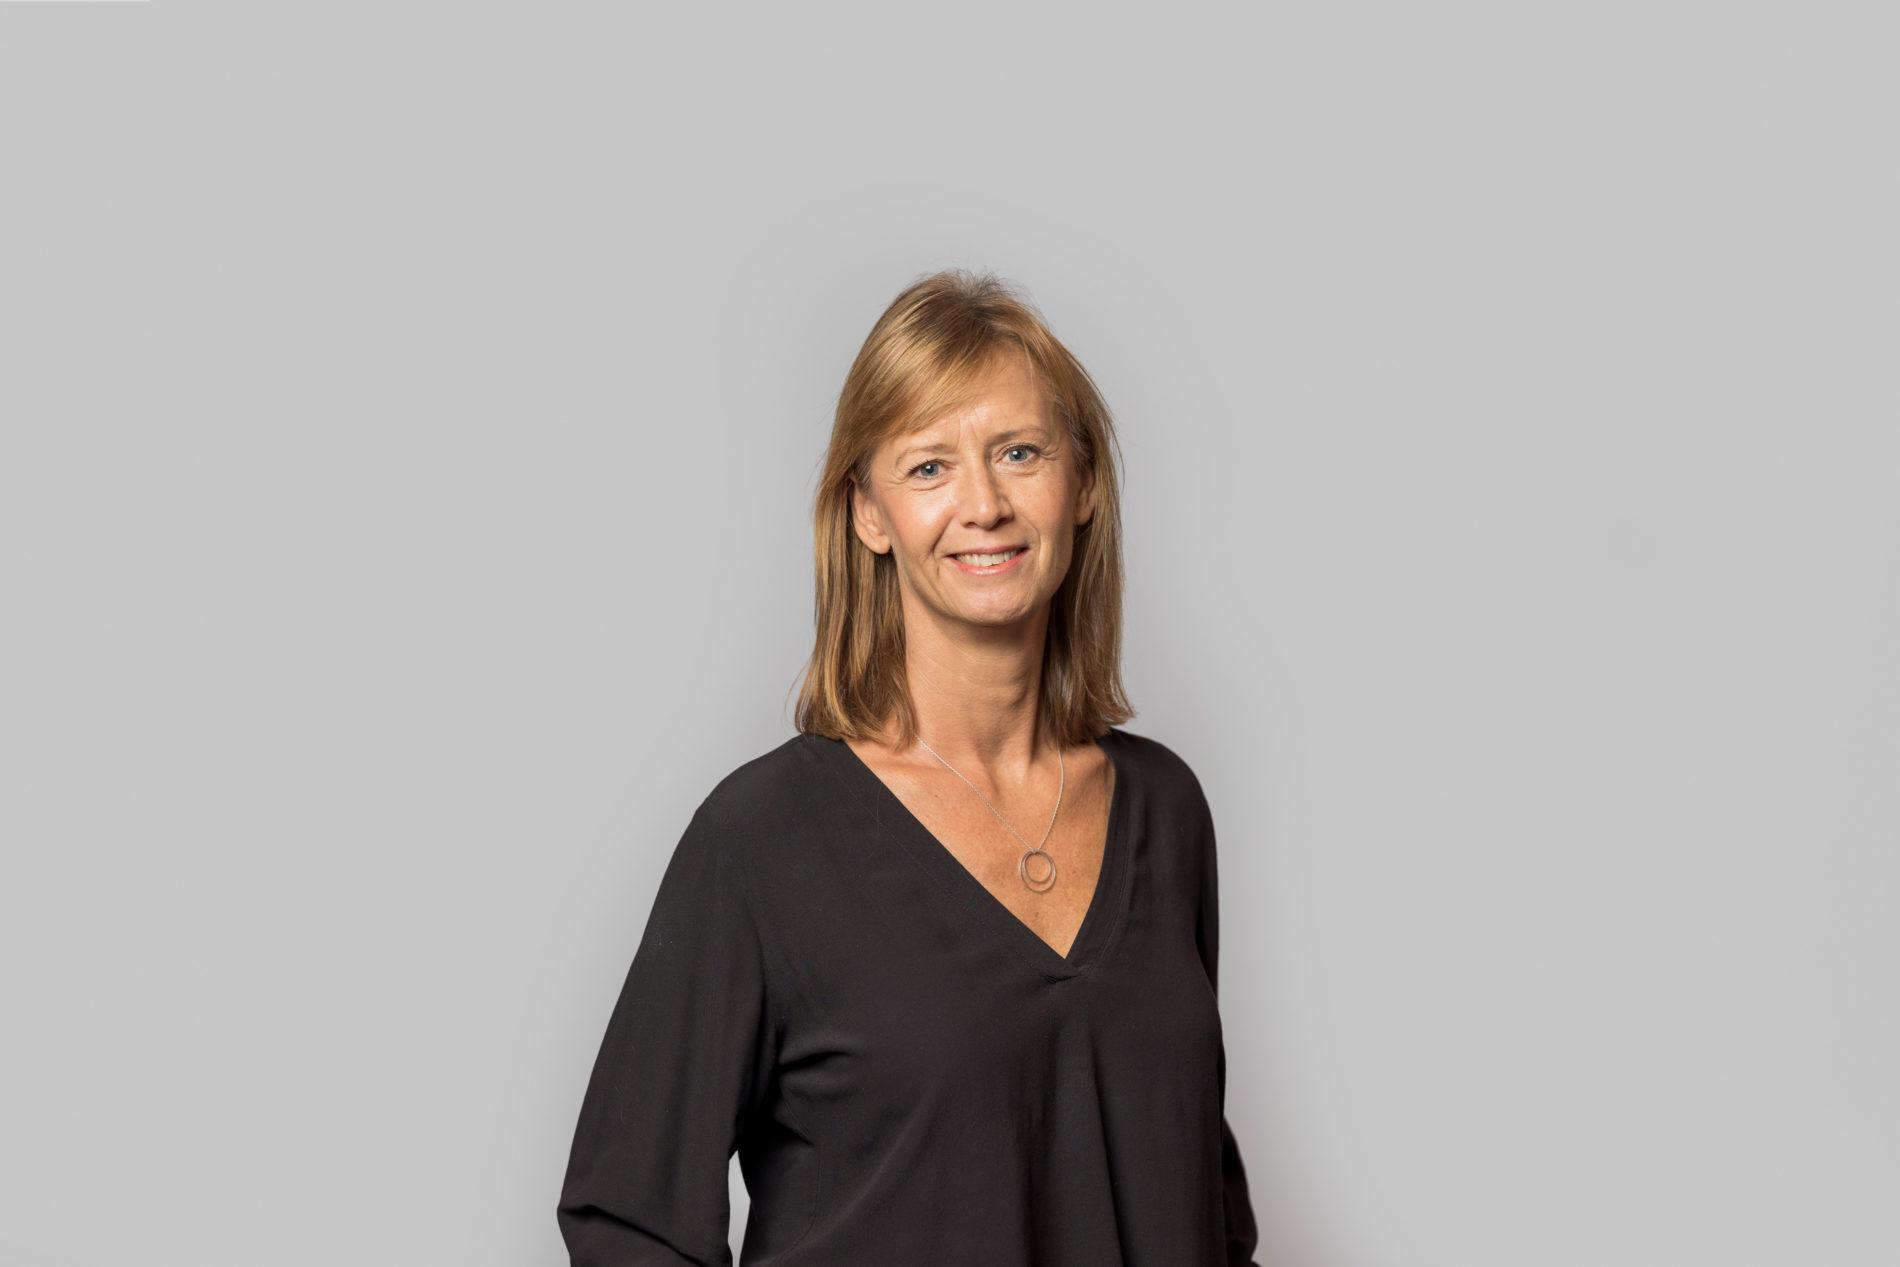 Susanne Wallberg